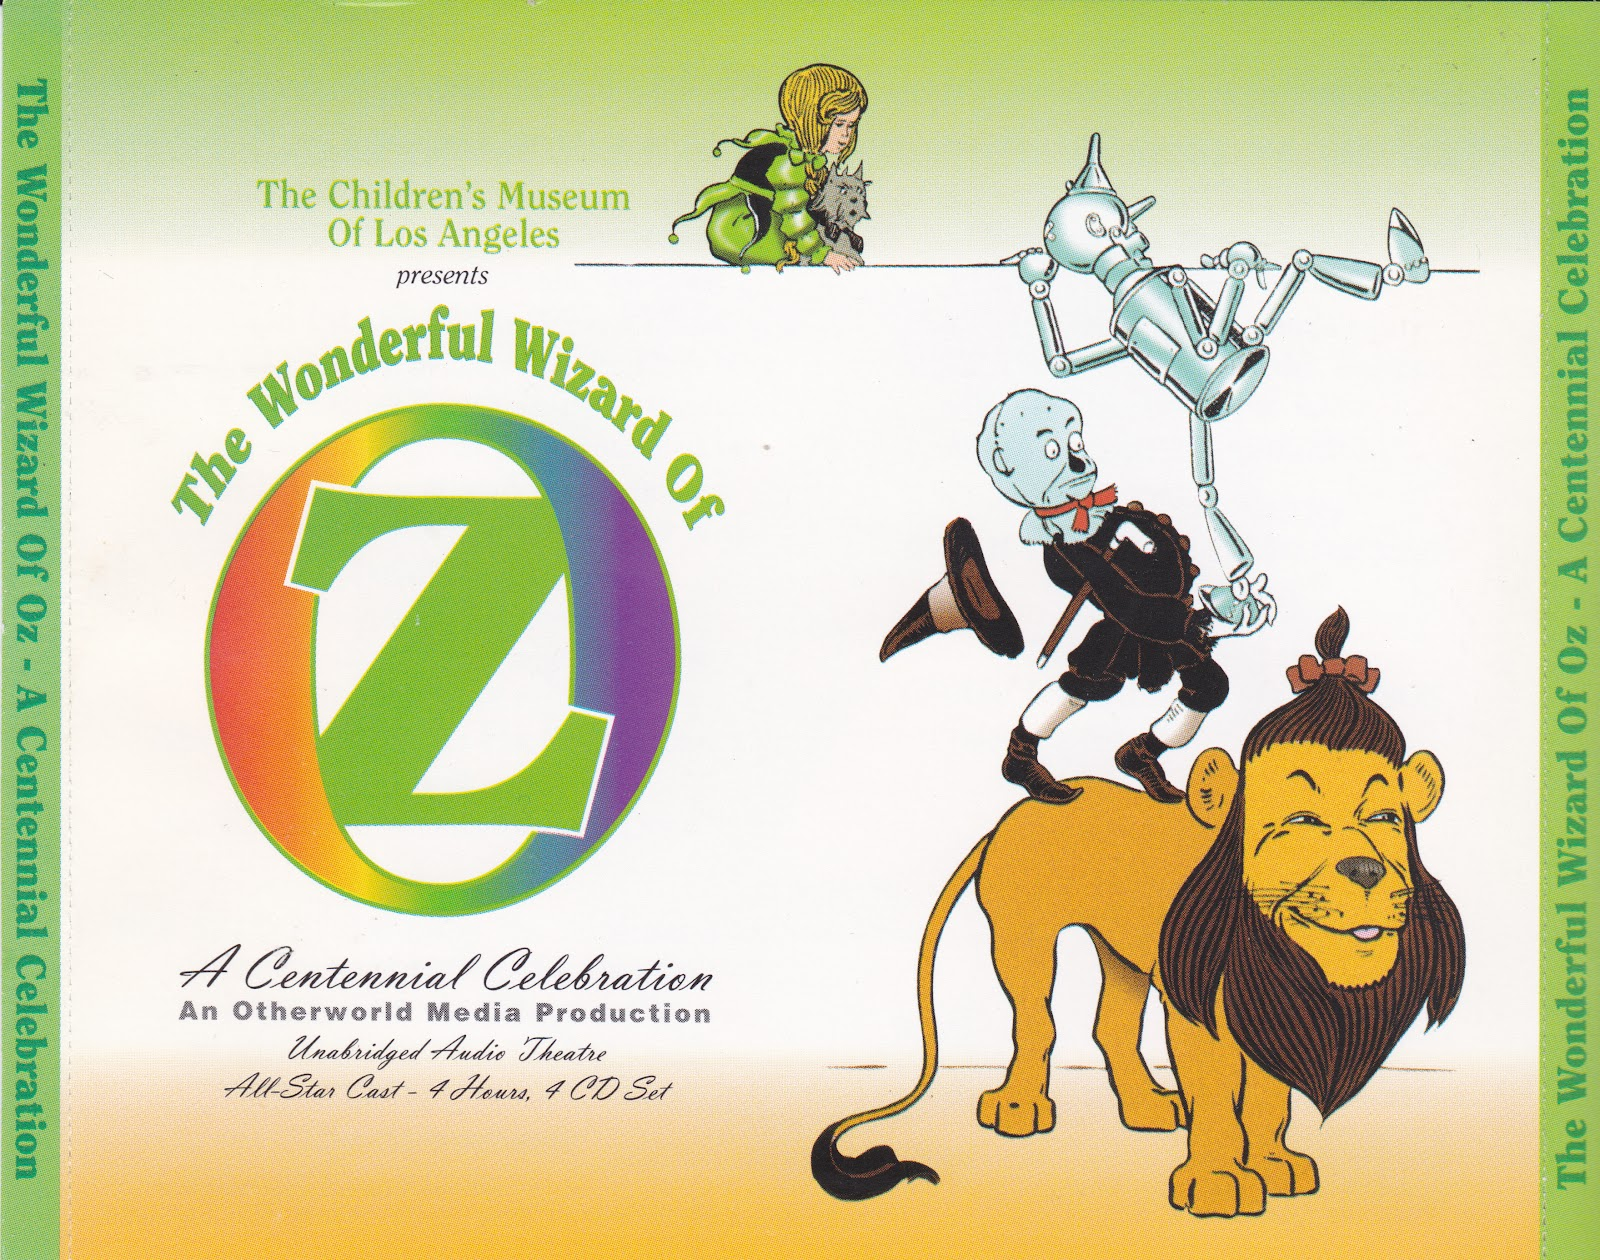 The wonderful wizard of oz a centennial celebration